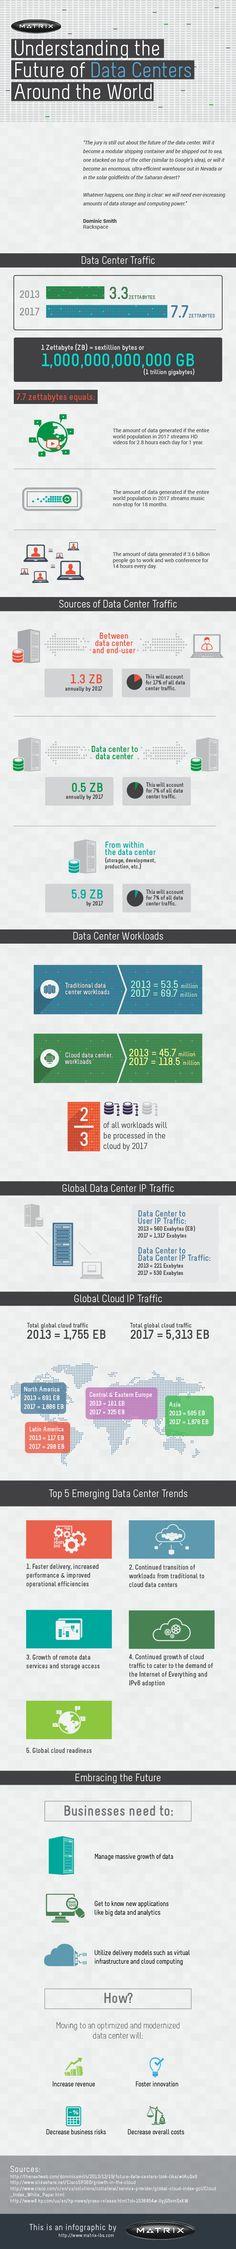 Understanding the Future of Data Centers Around the World   - Cloud trend stats - 2014 + forward - Matrix